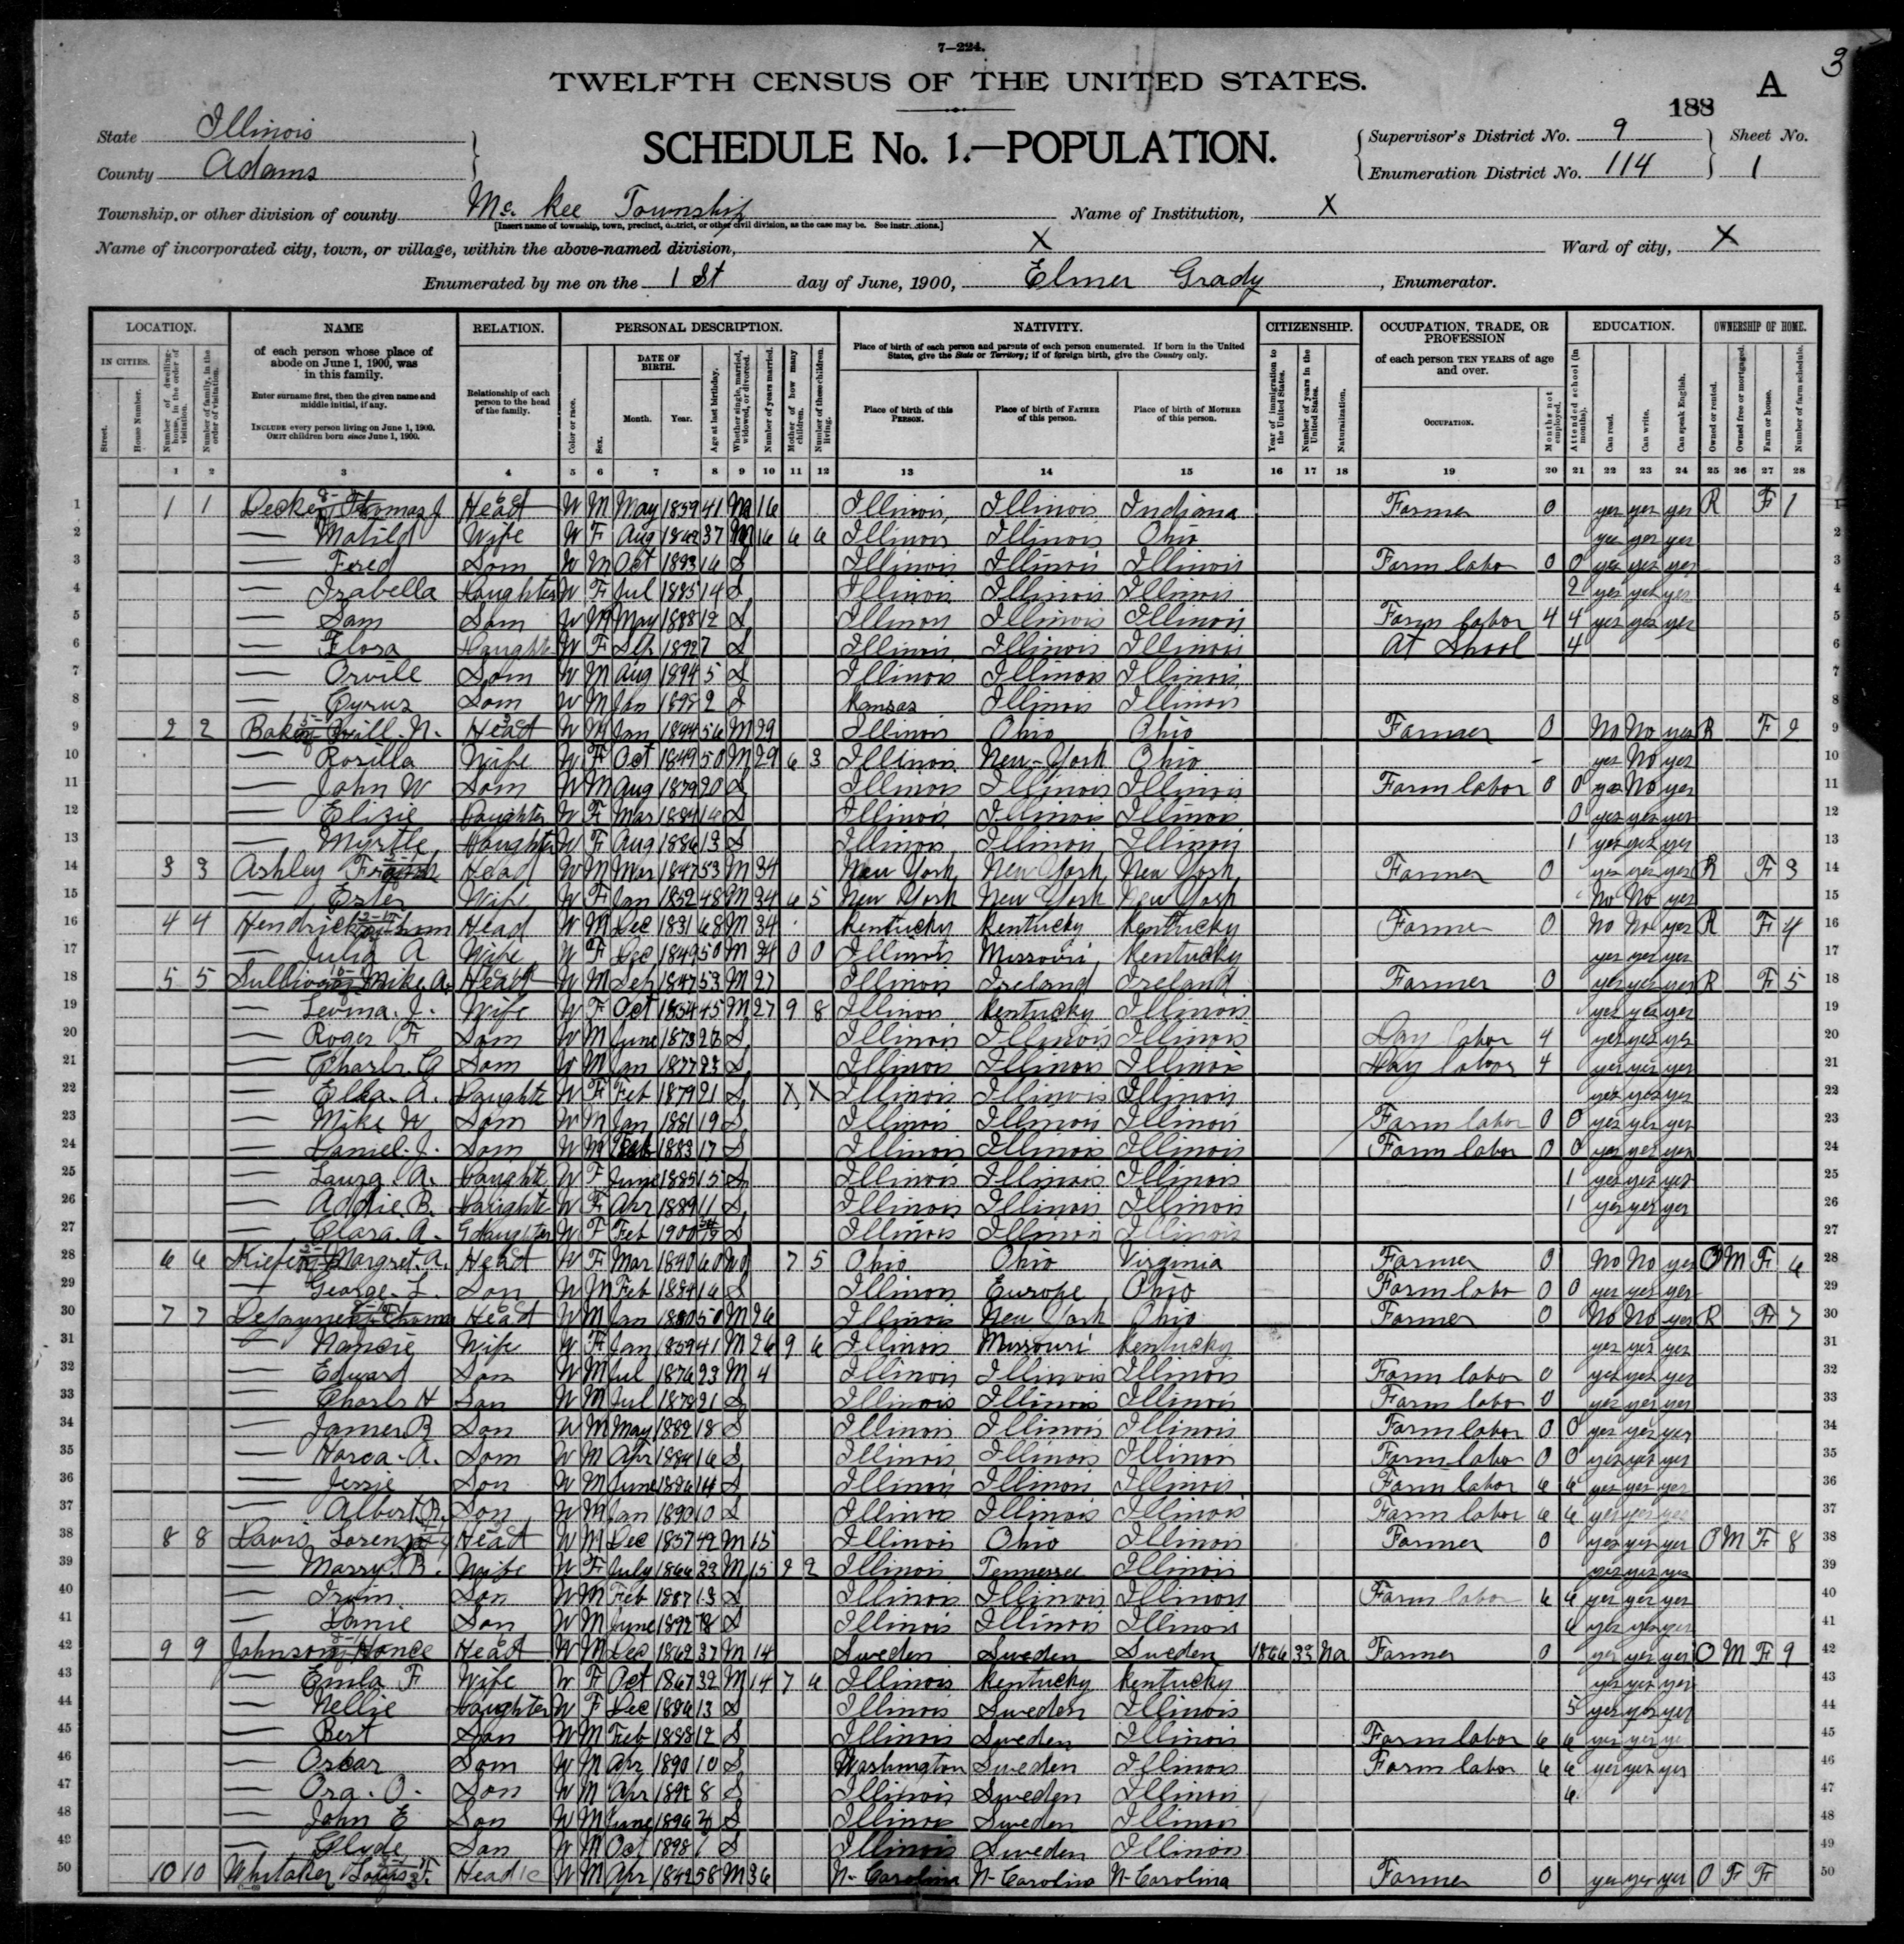 Illinois: ADAMS County, Enumeration District 114, Sheet No. 1A